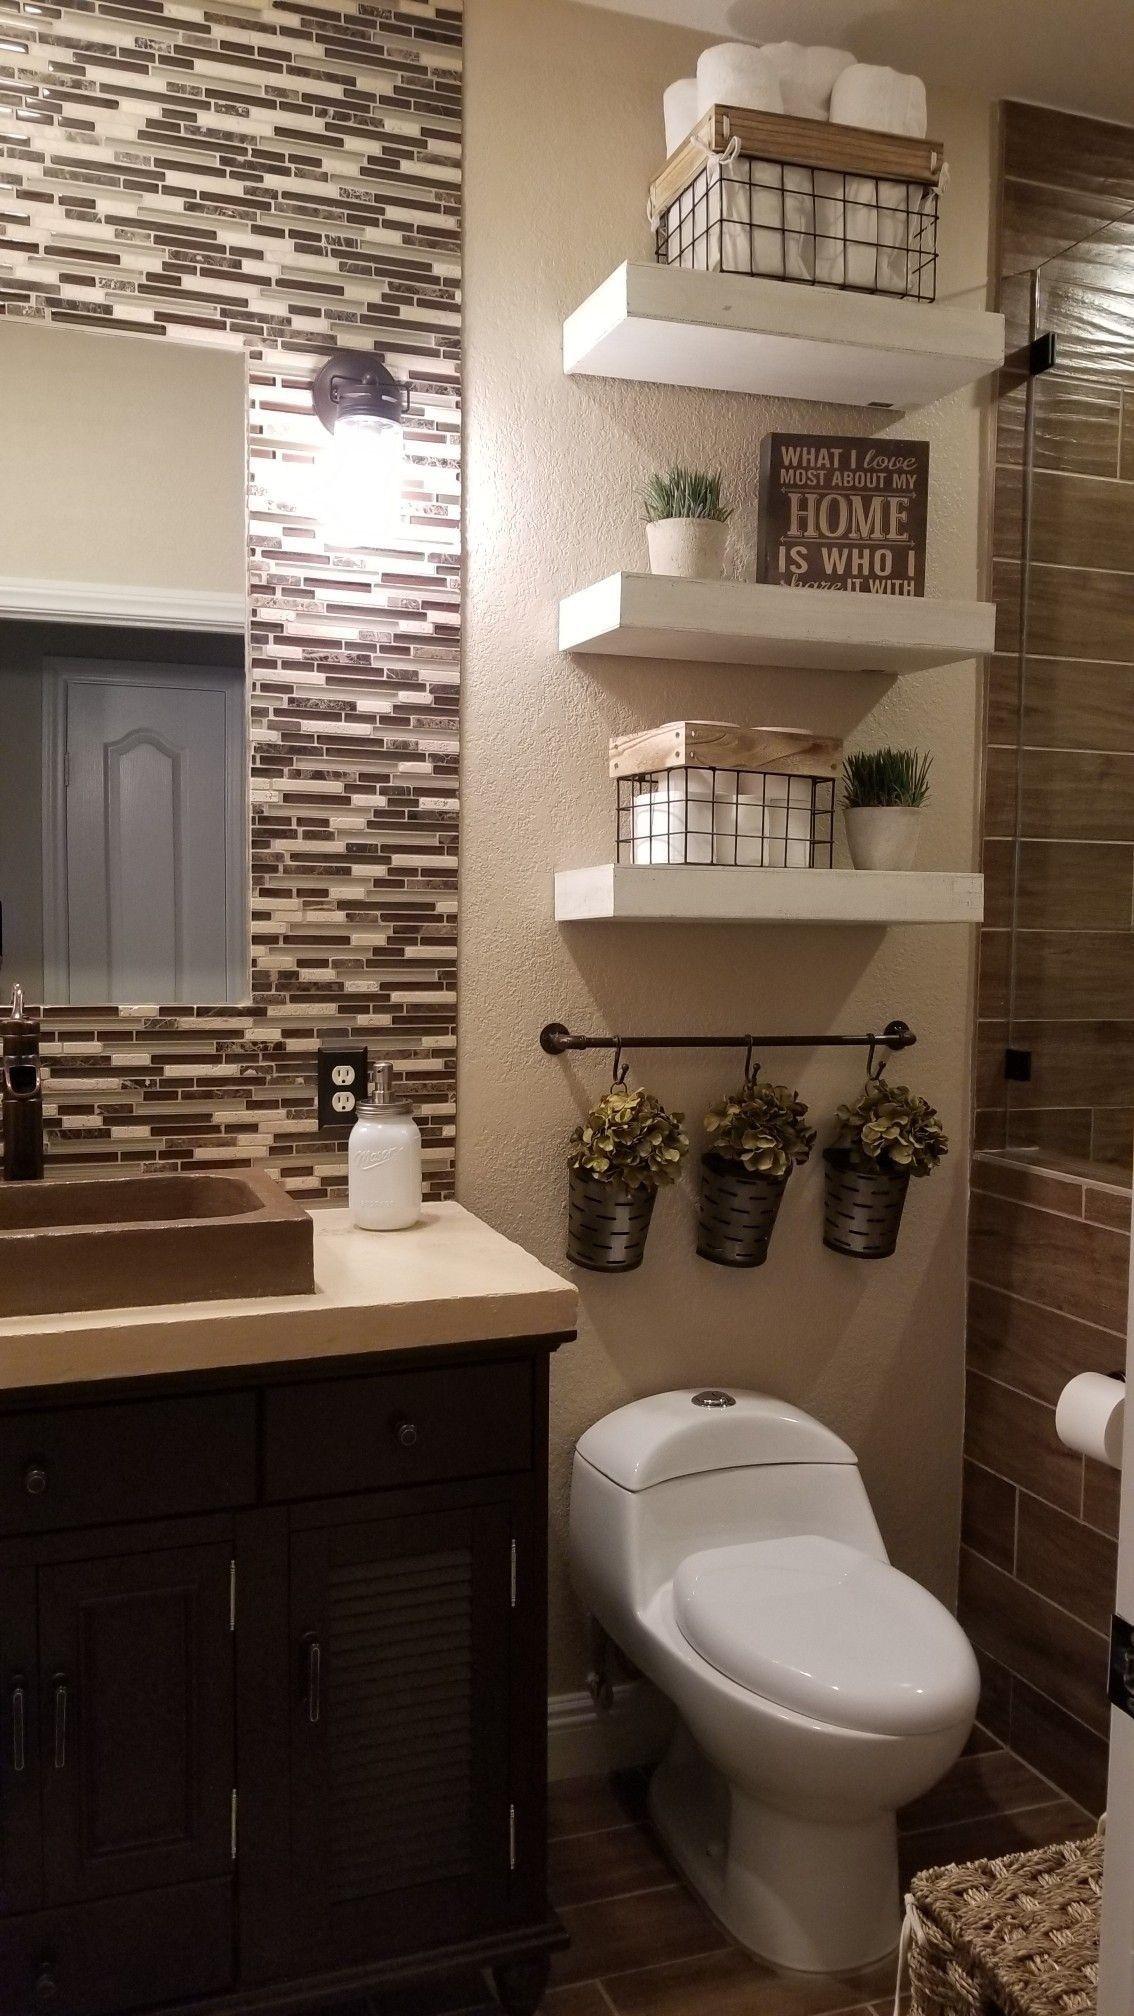 32 Wonderful Bathroom Decoration Ideas With Farmhouse Style Guest Bathroom Decor Small Bathroom Remodel Small Bathroom Decor Decorating ideas bathroom flooring